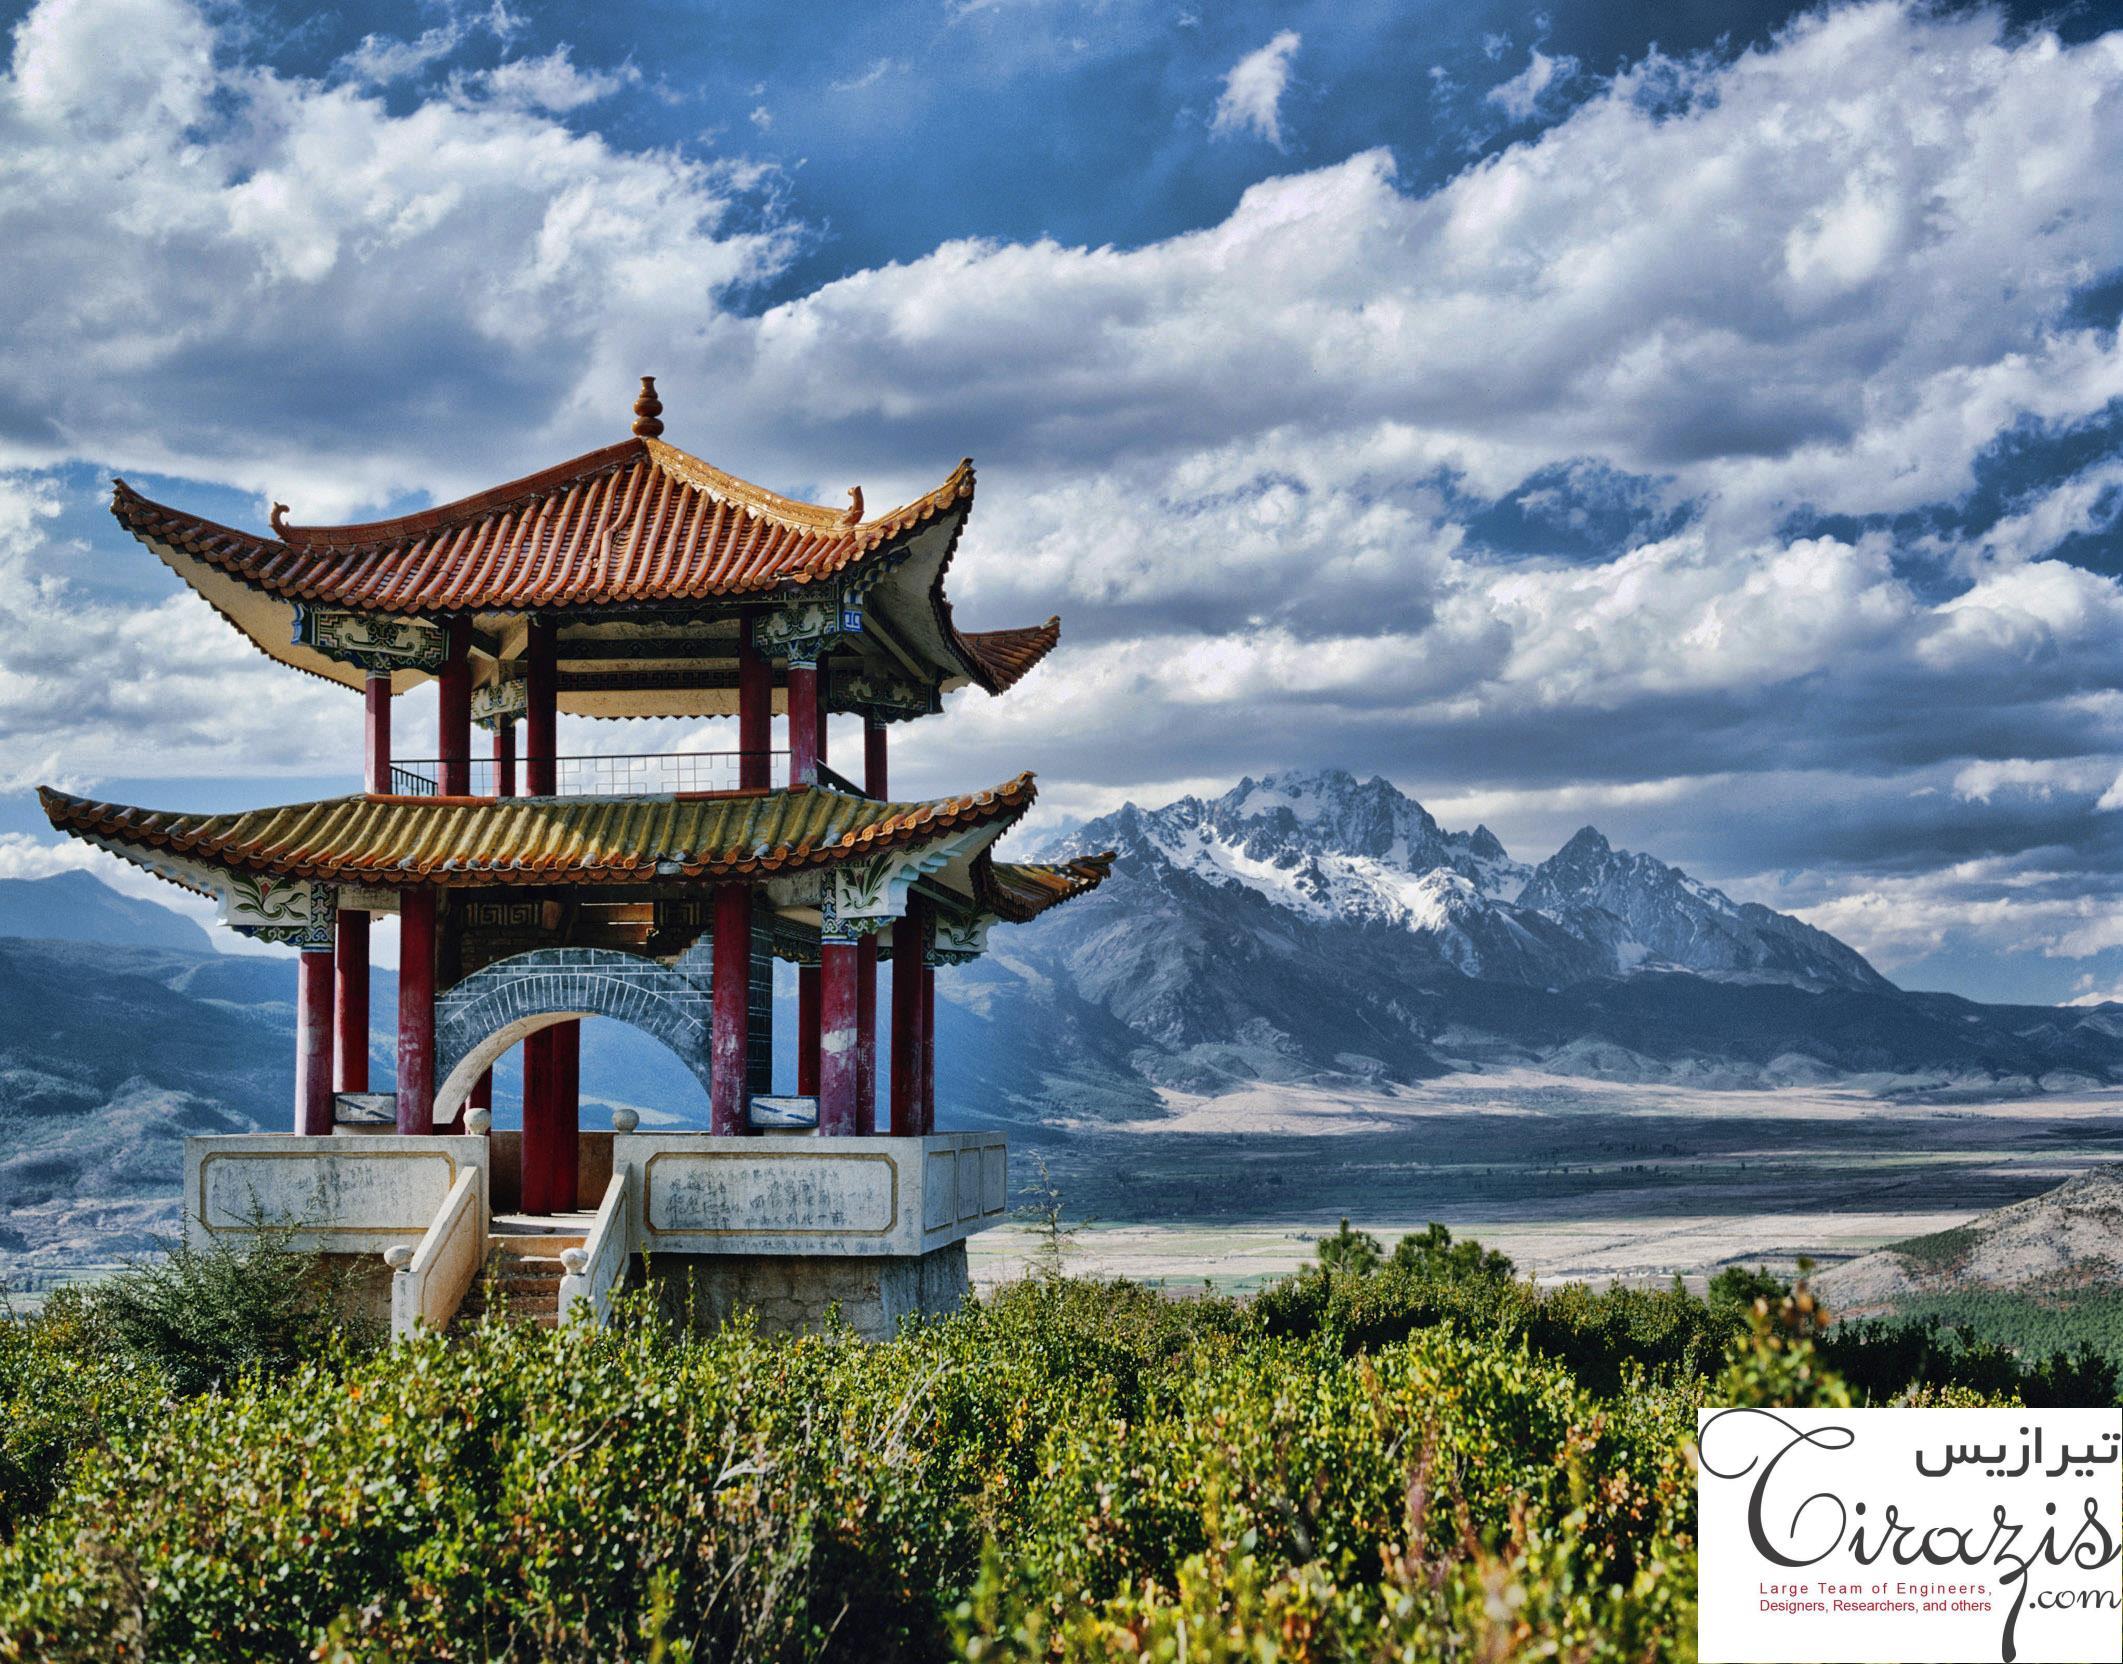 دانلود پروژه پاورپوینت معماری چین